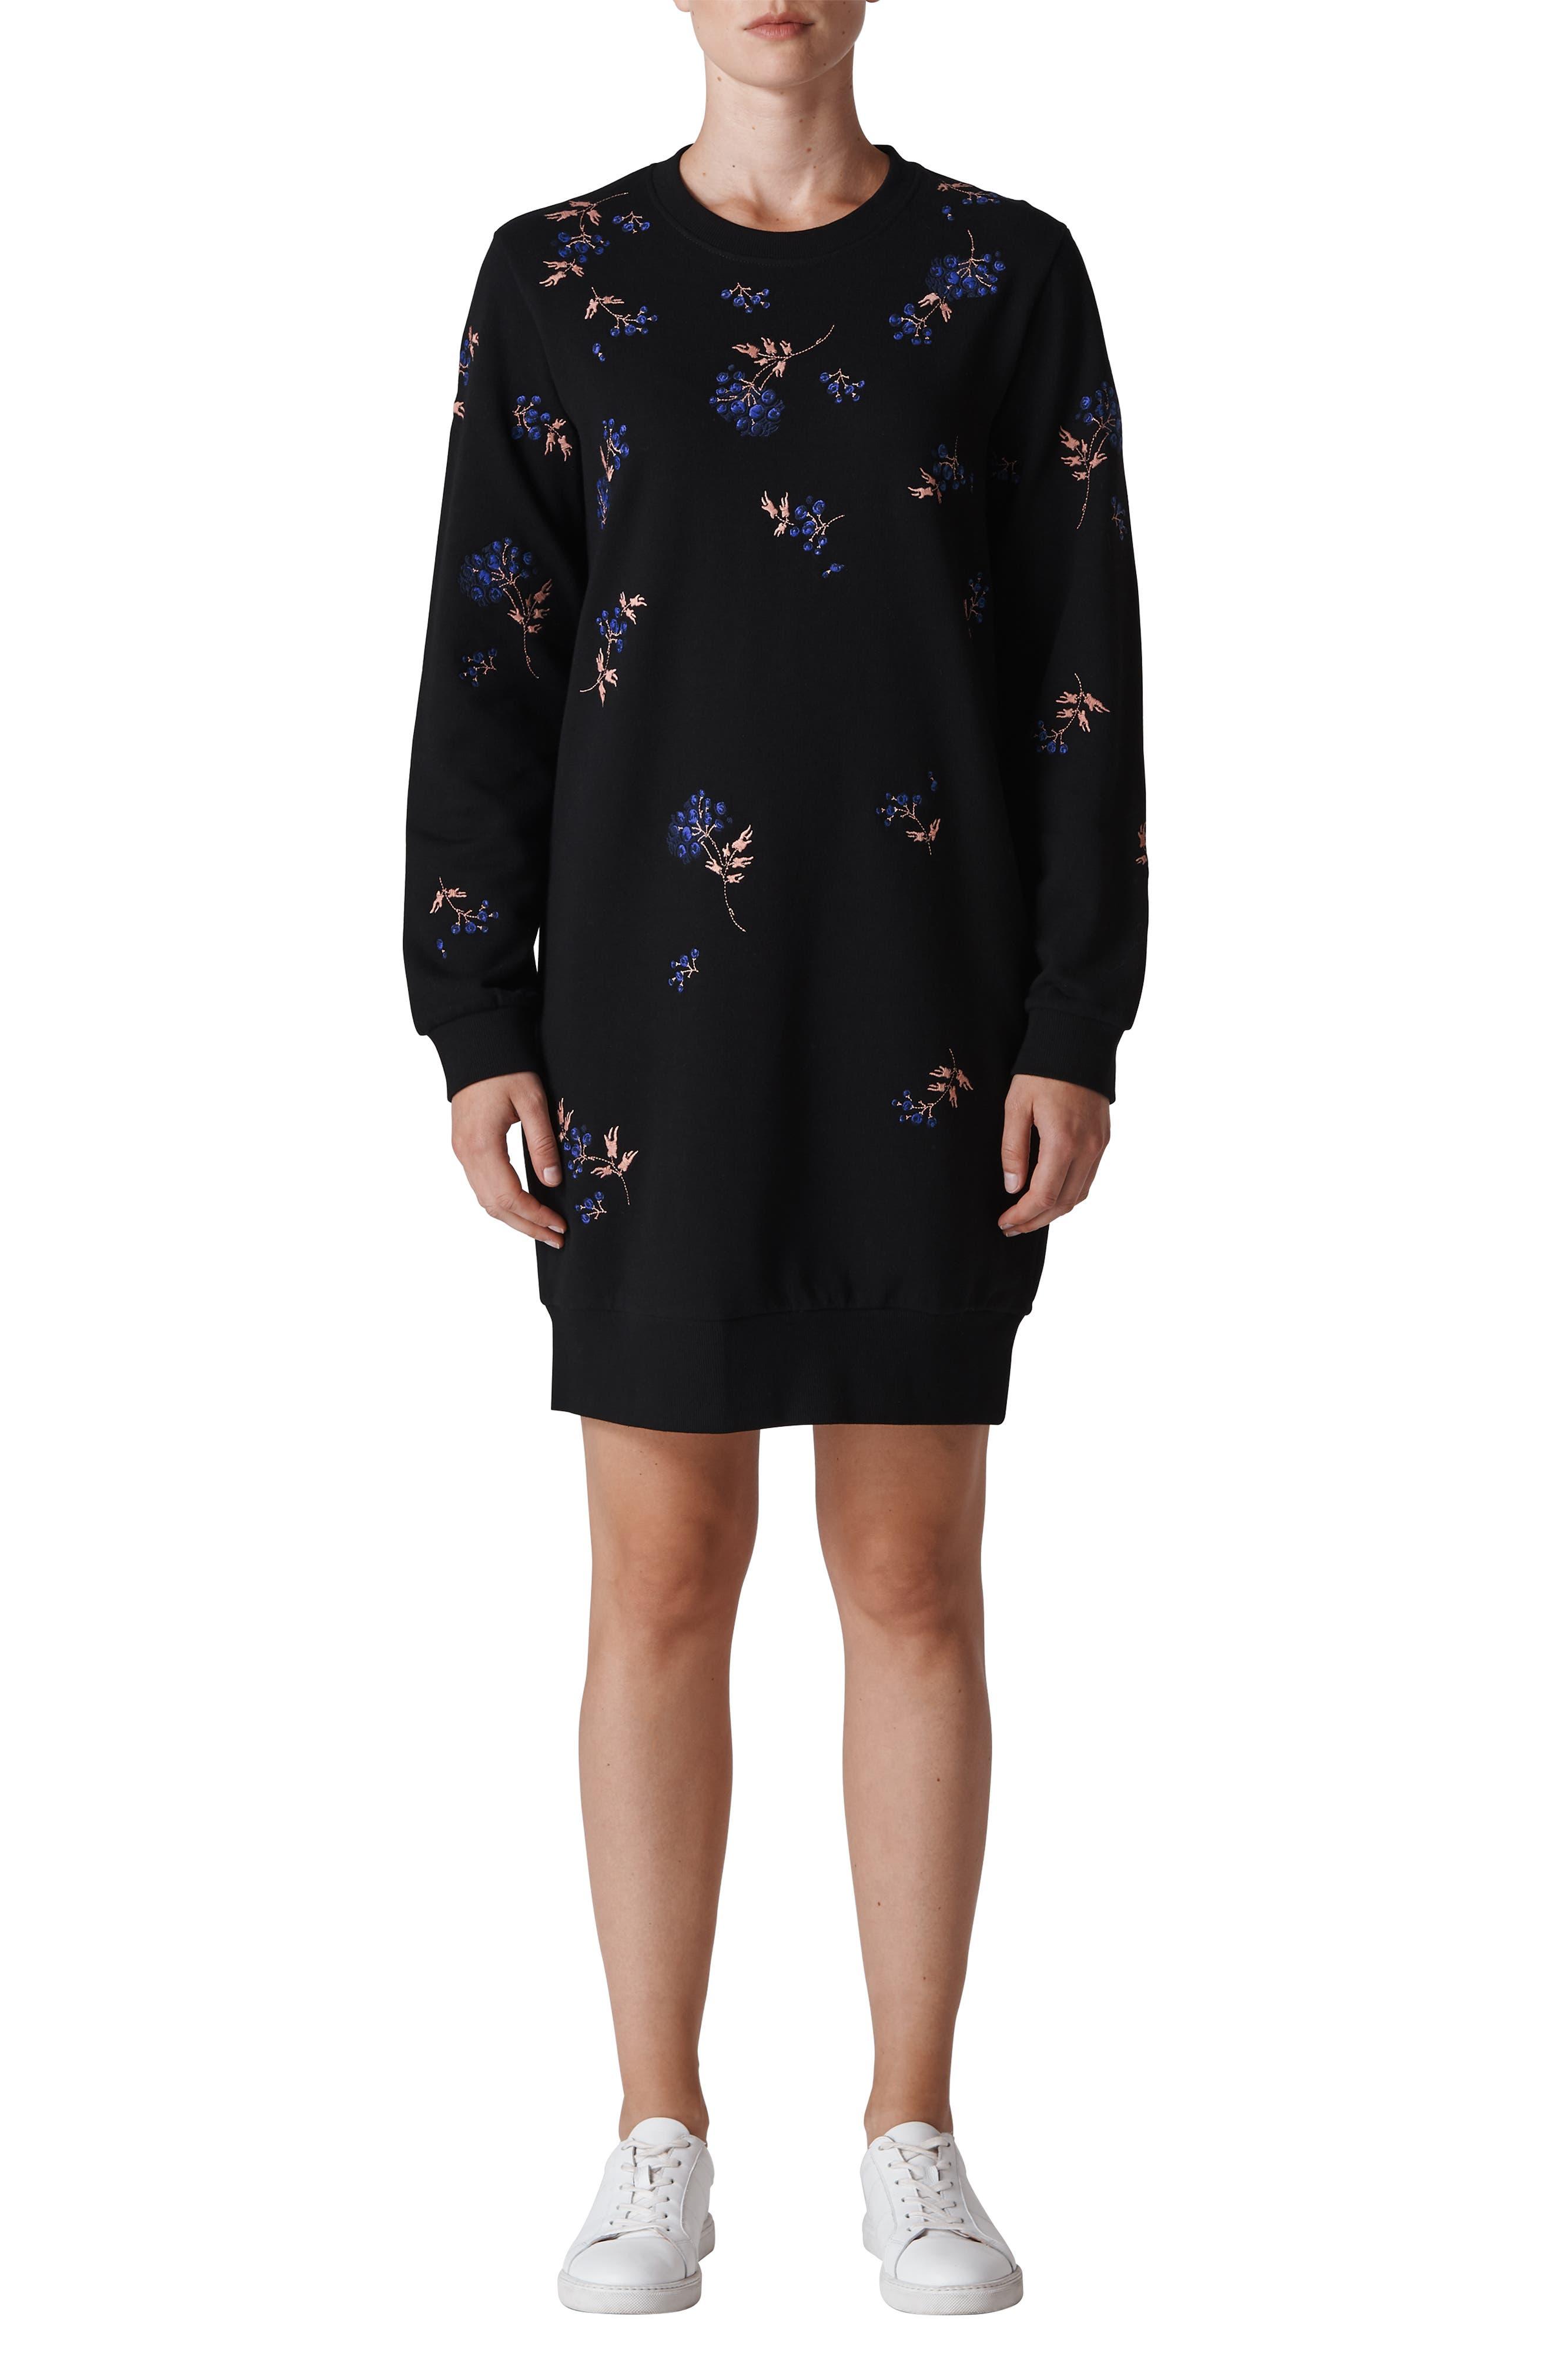 Elderberry Embroidered Sweatshirt Dress,                         Main,                         color, MULTI COLOR